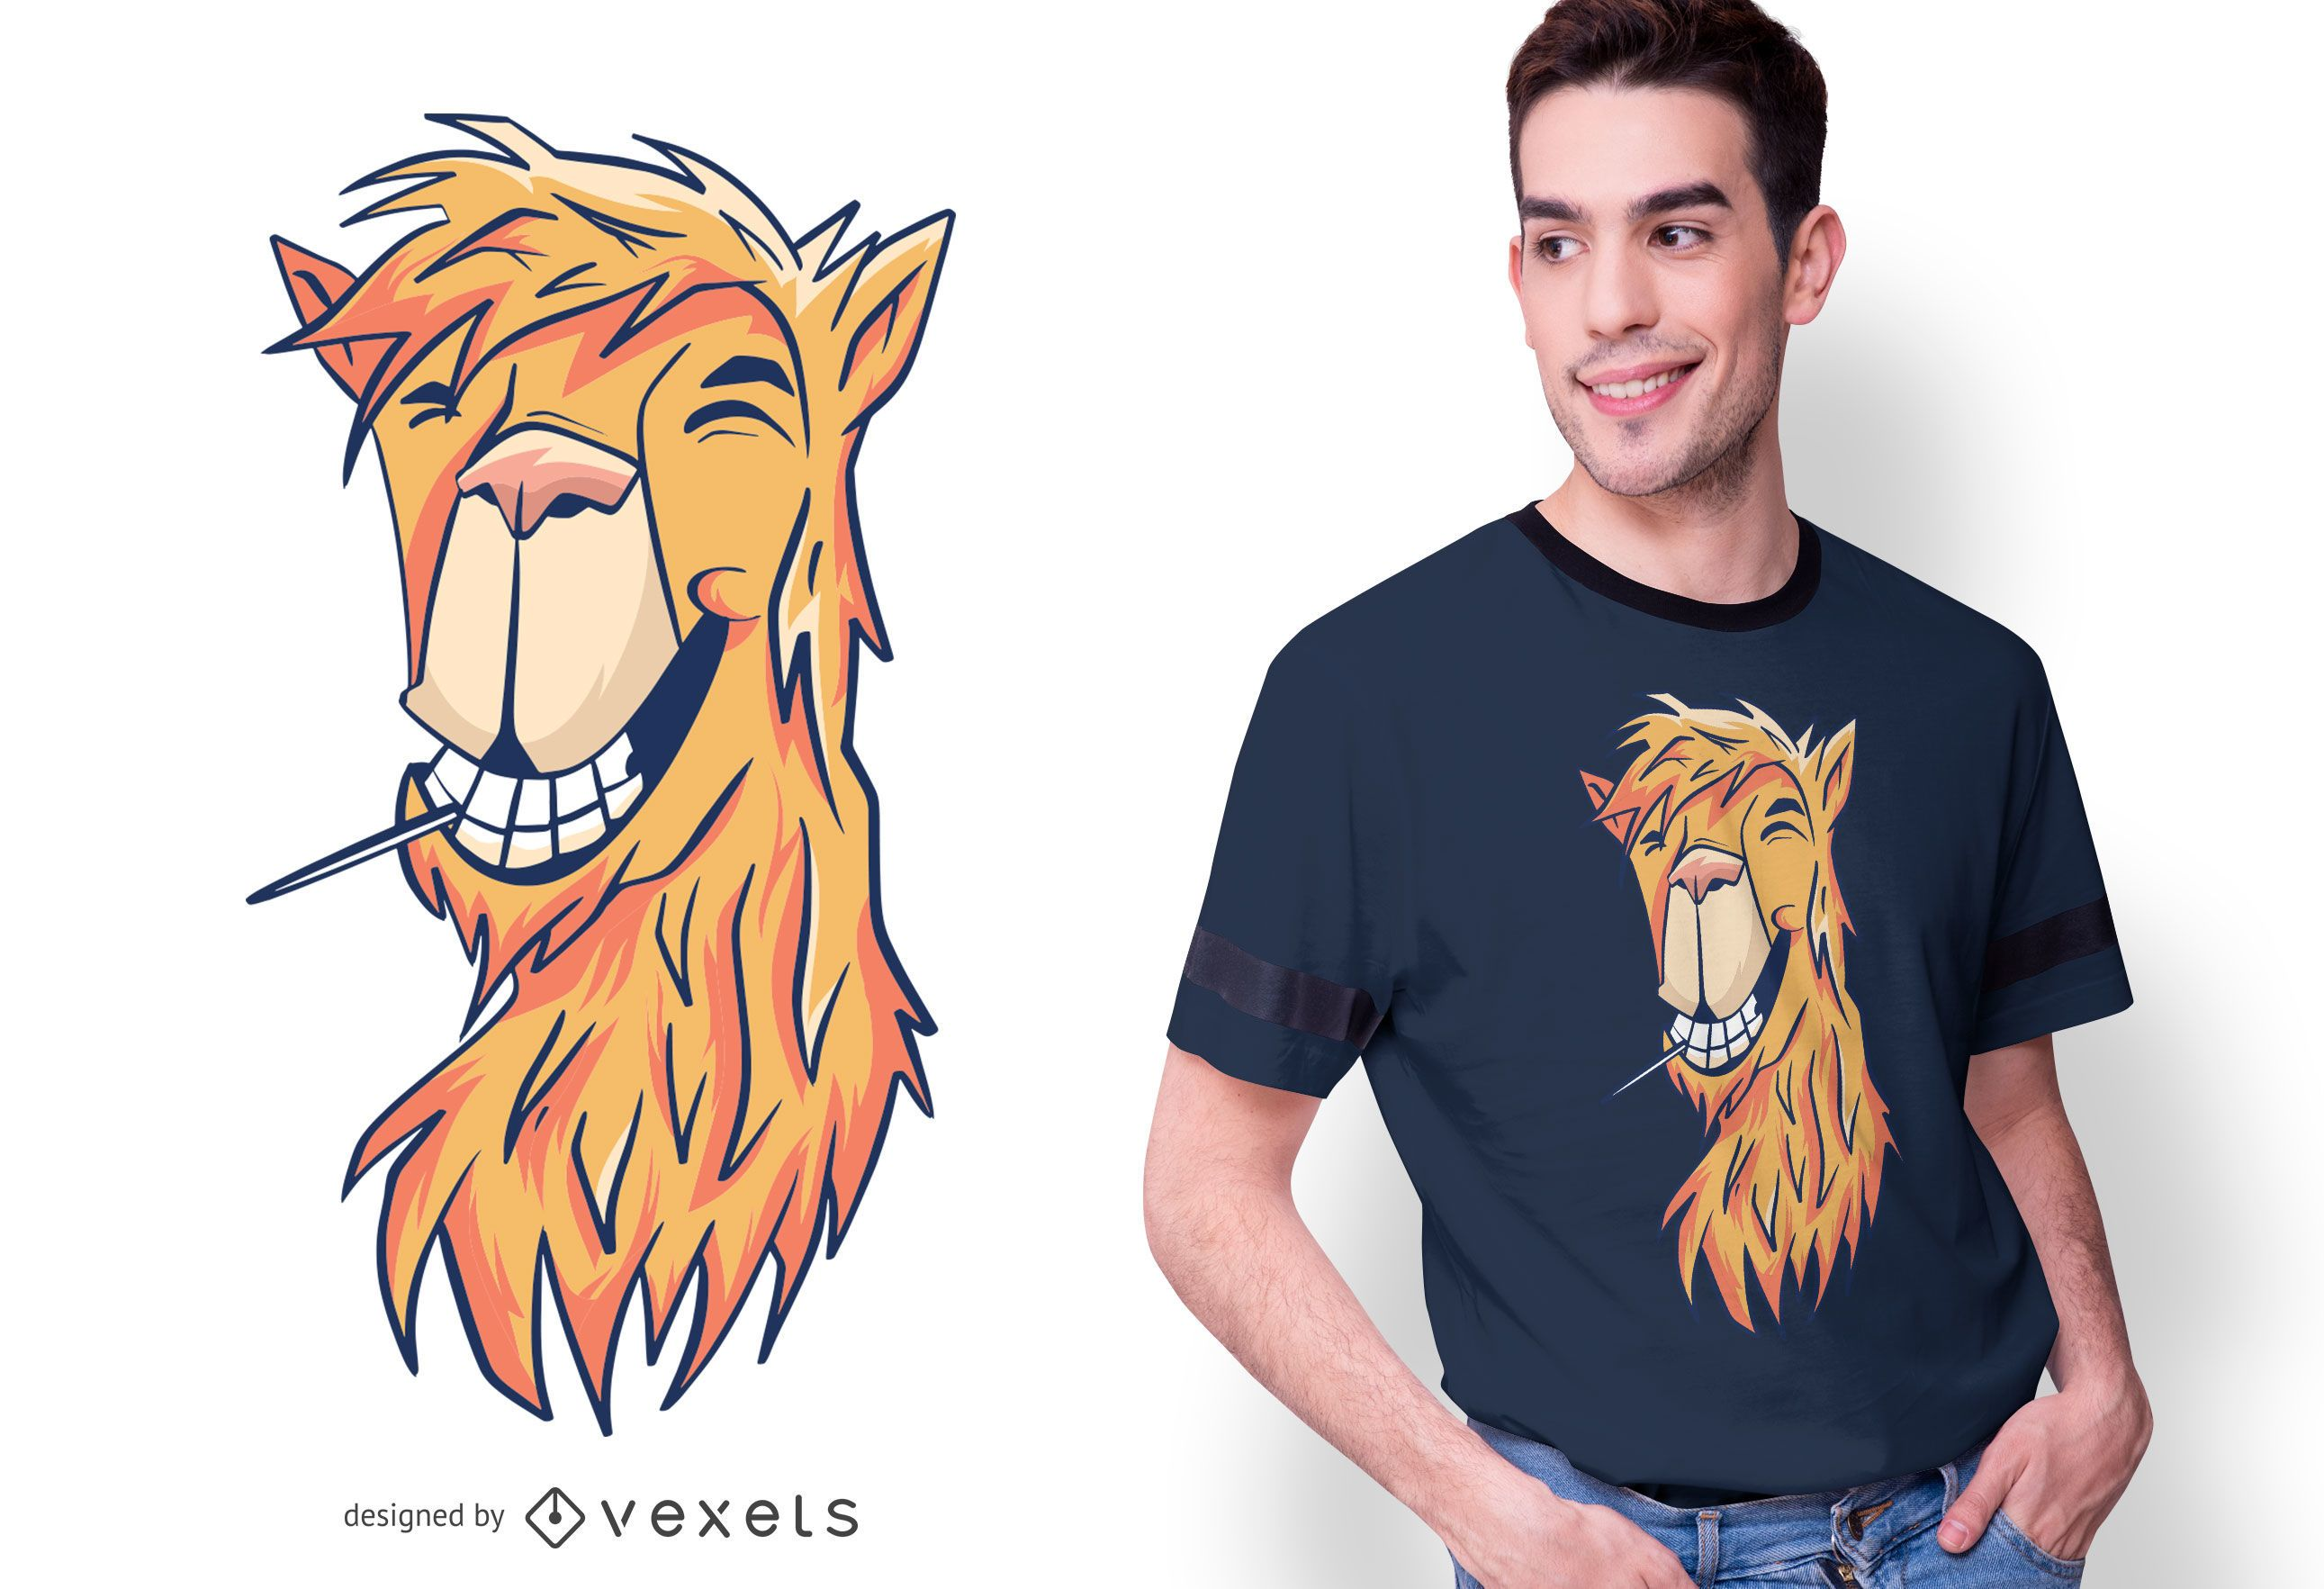 Chill llama t-shirt design